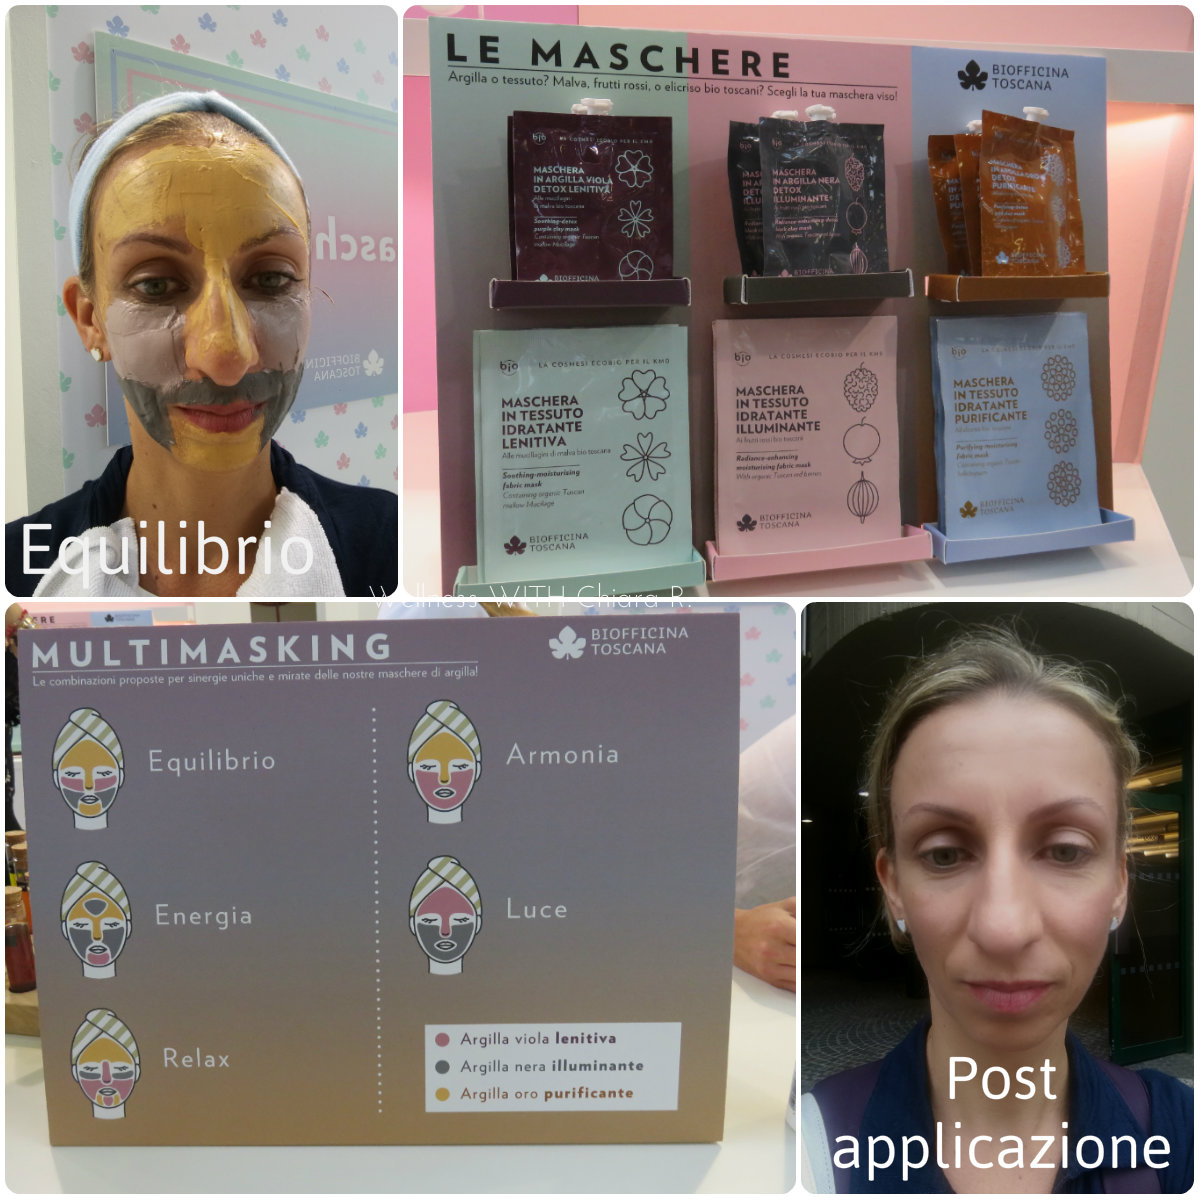 Multimasking Biofficina Toscana